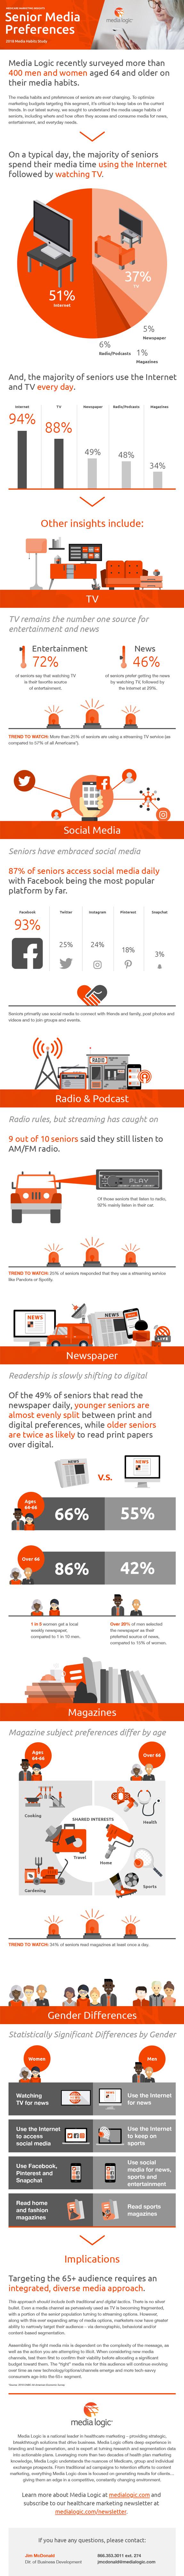 senior media habits